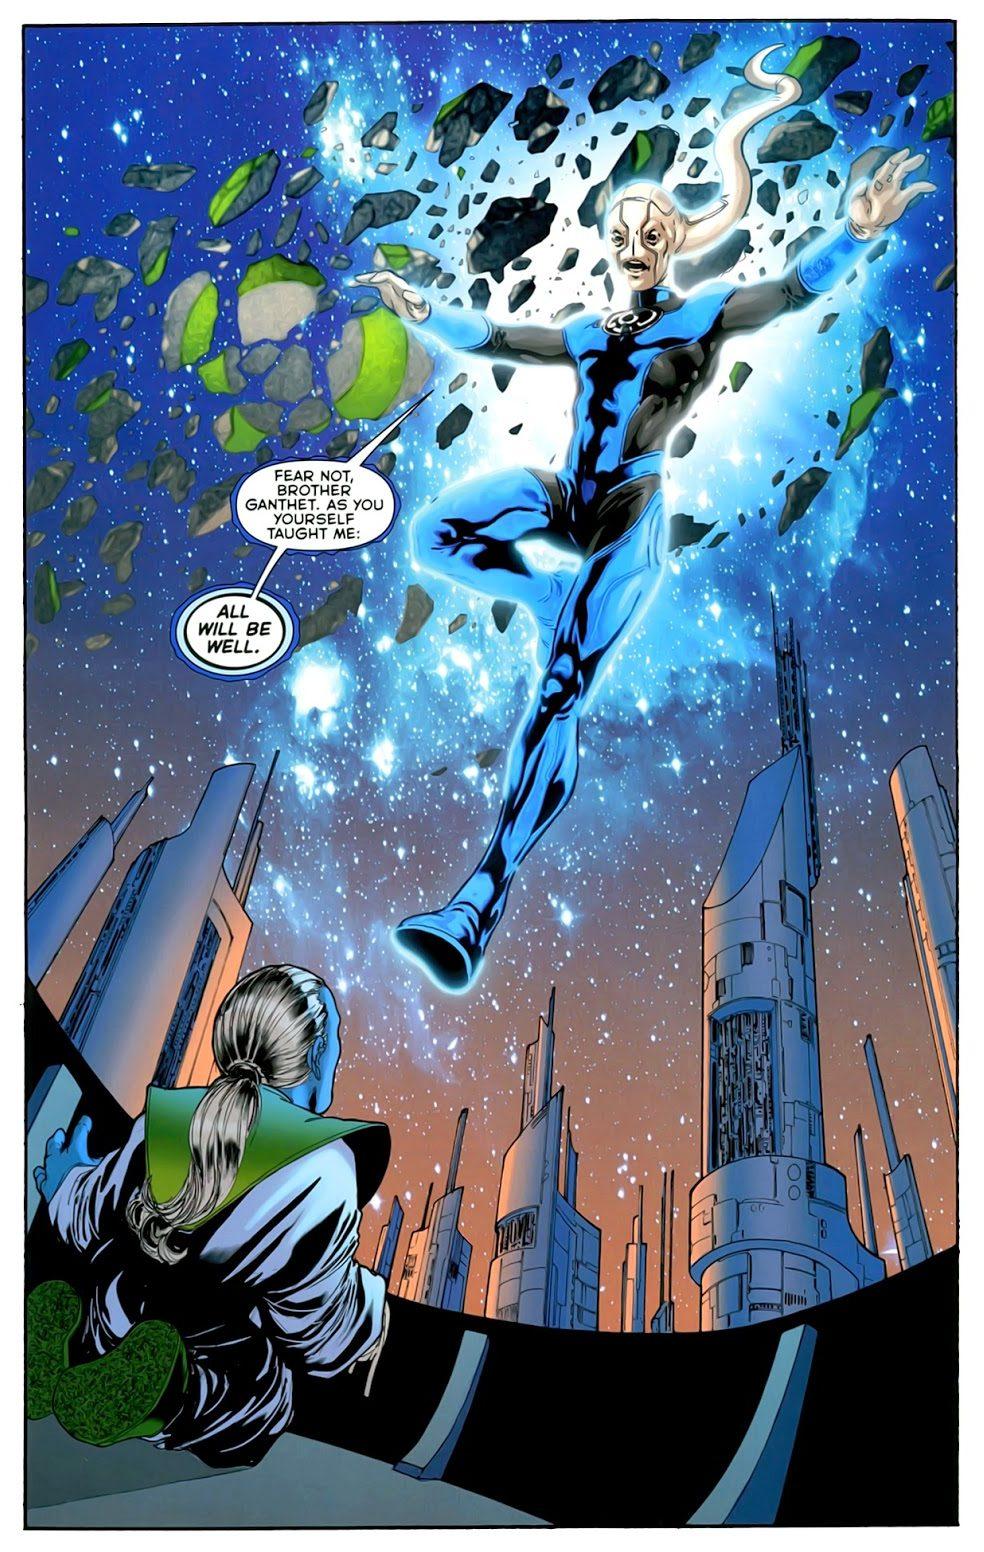 Blue Lantern Saint Walker (War of the Green Lanterns Aftermath #1)